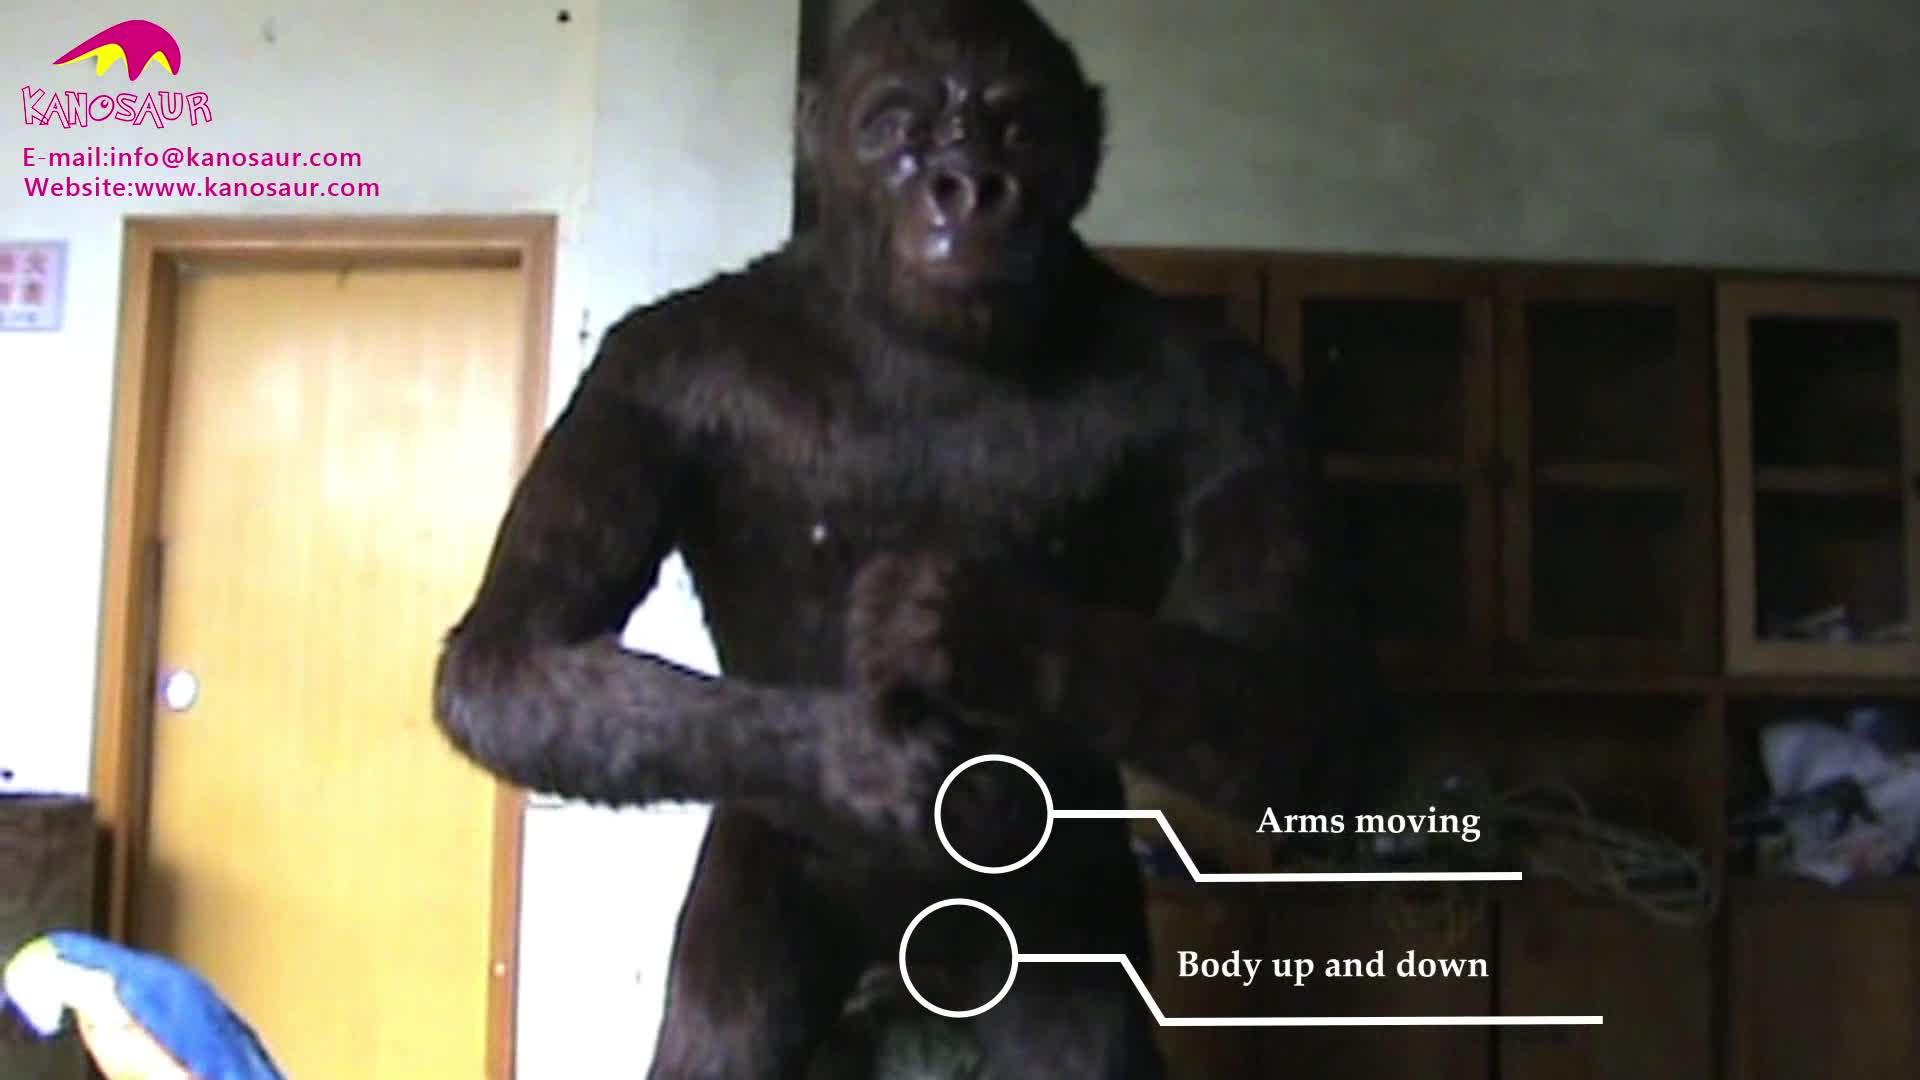 KANOSAUR0568ที่น่าตื่นตาตื่นใจจริงเทียมAnimatronicชีวิตขนาดKing Kong